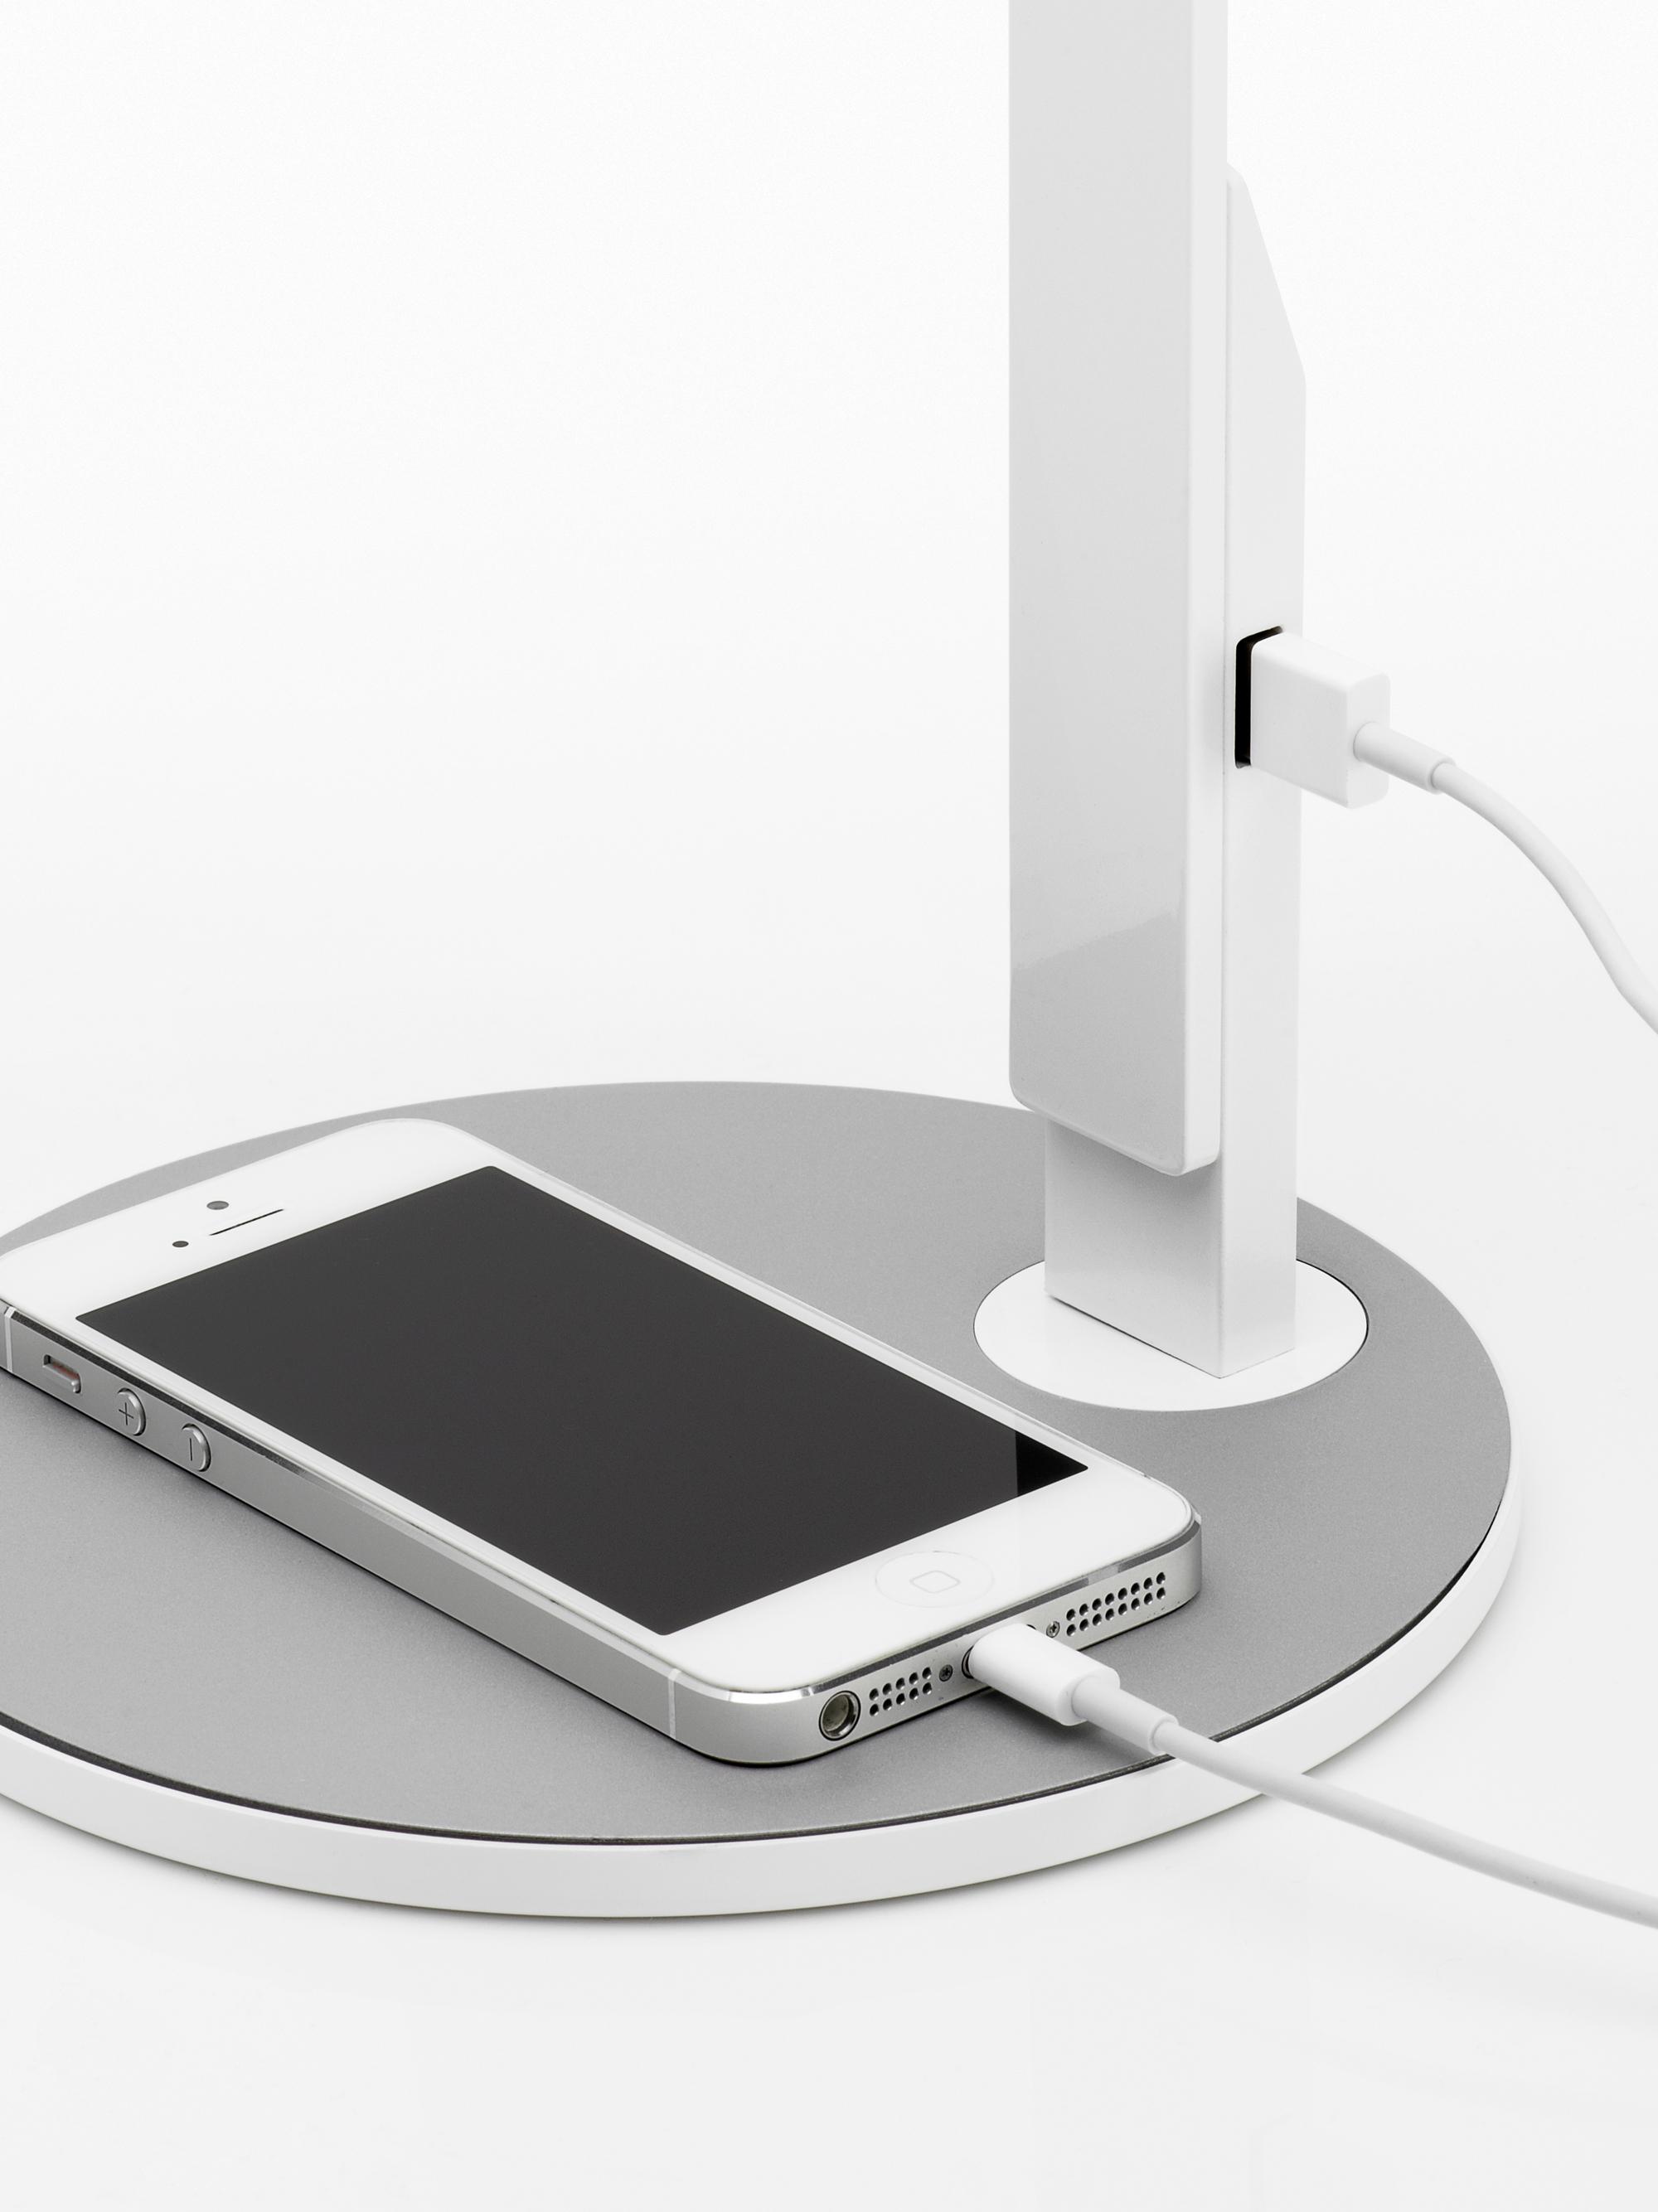 lim360_white_iphone5_crop_72_download.JPG